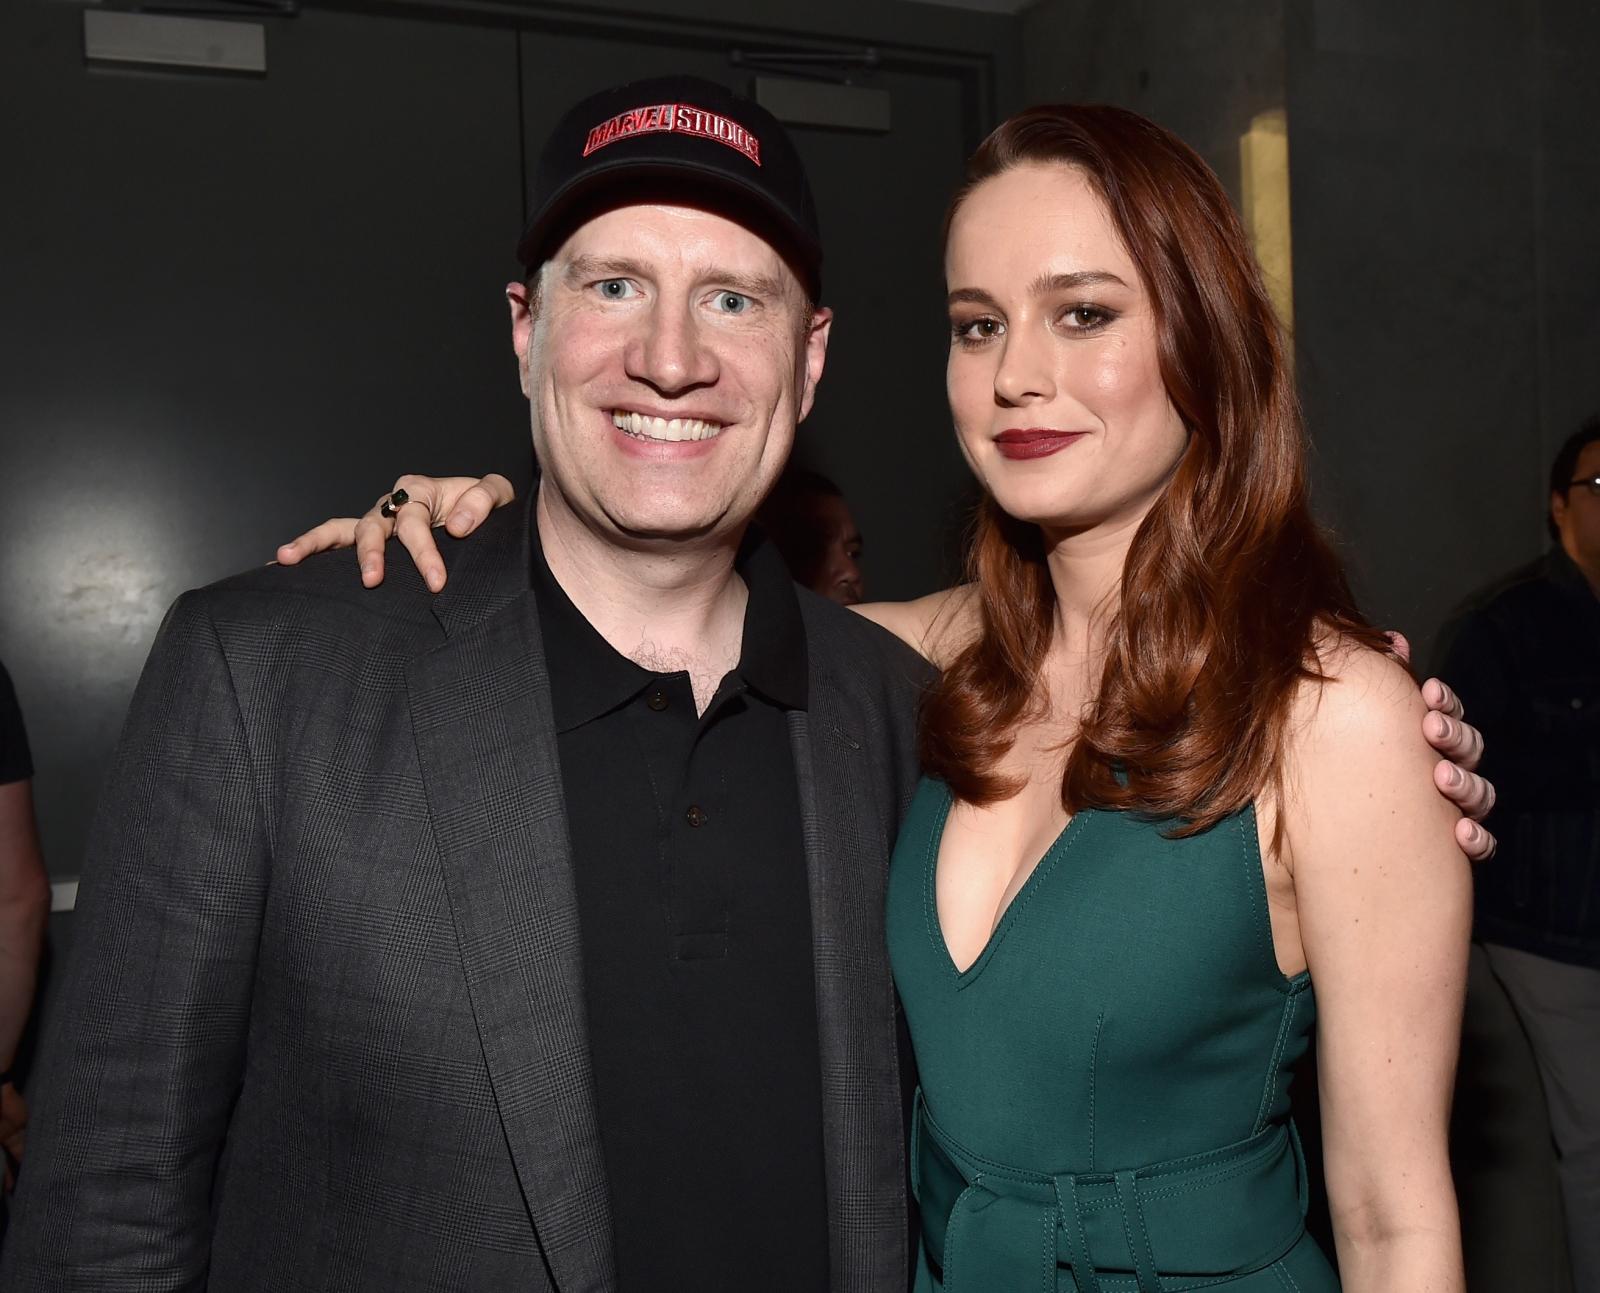 Brie Larson announced as Captain Marvel at Comic-Con 2016